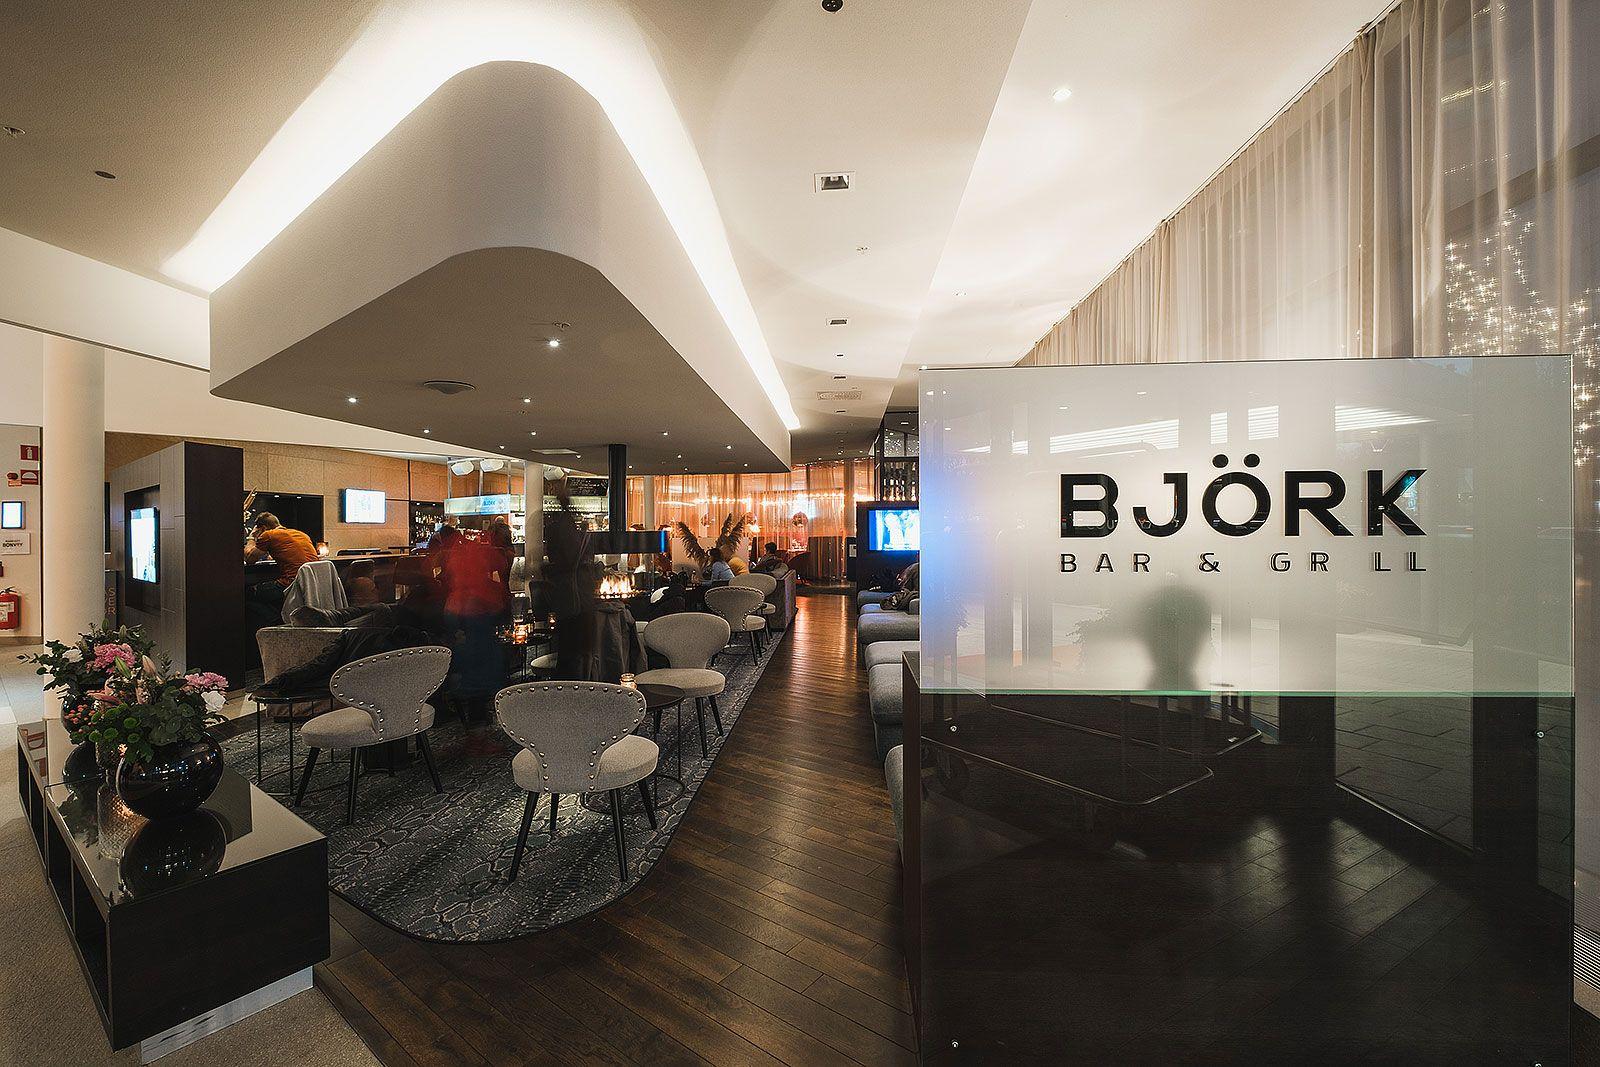 Björk Bar & Grill – Restaurang, Bar – Kungsholmen, Stockholm